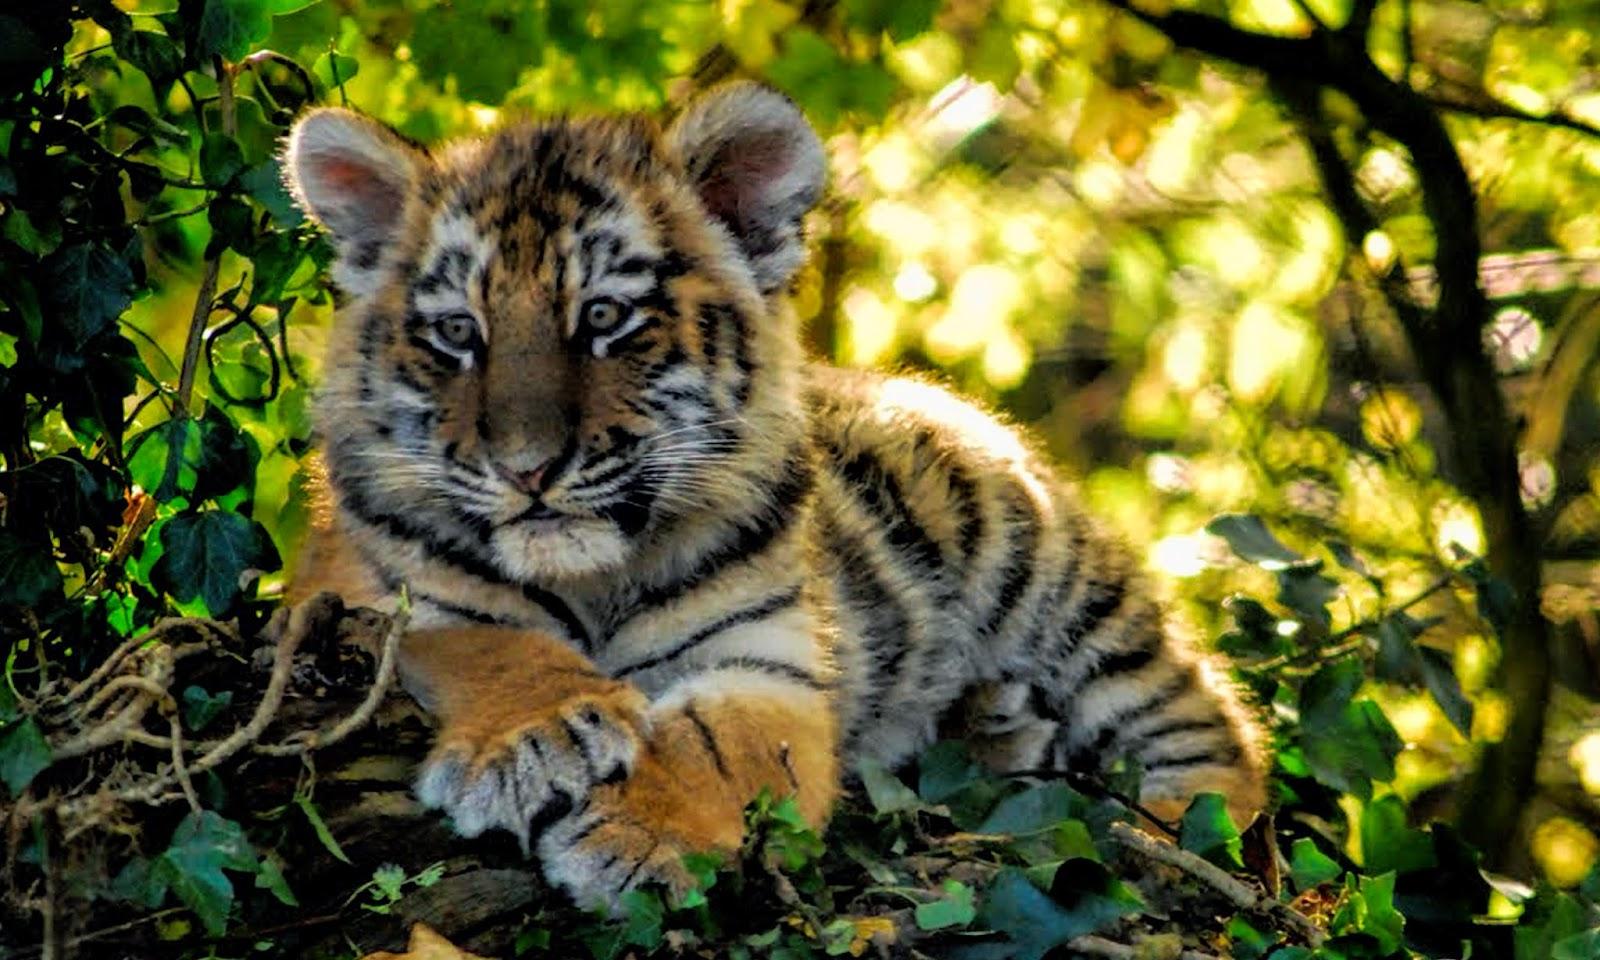 Tiger Cubs Wallpapers 1600x960